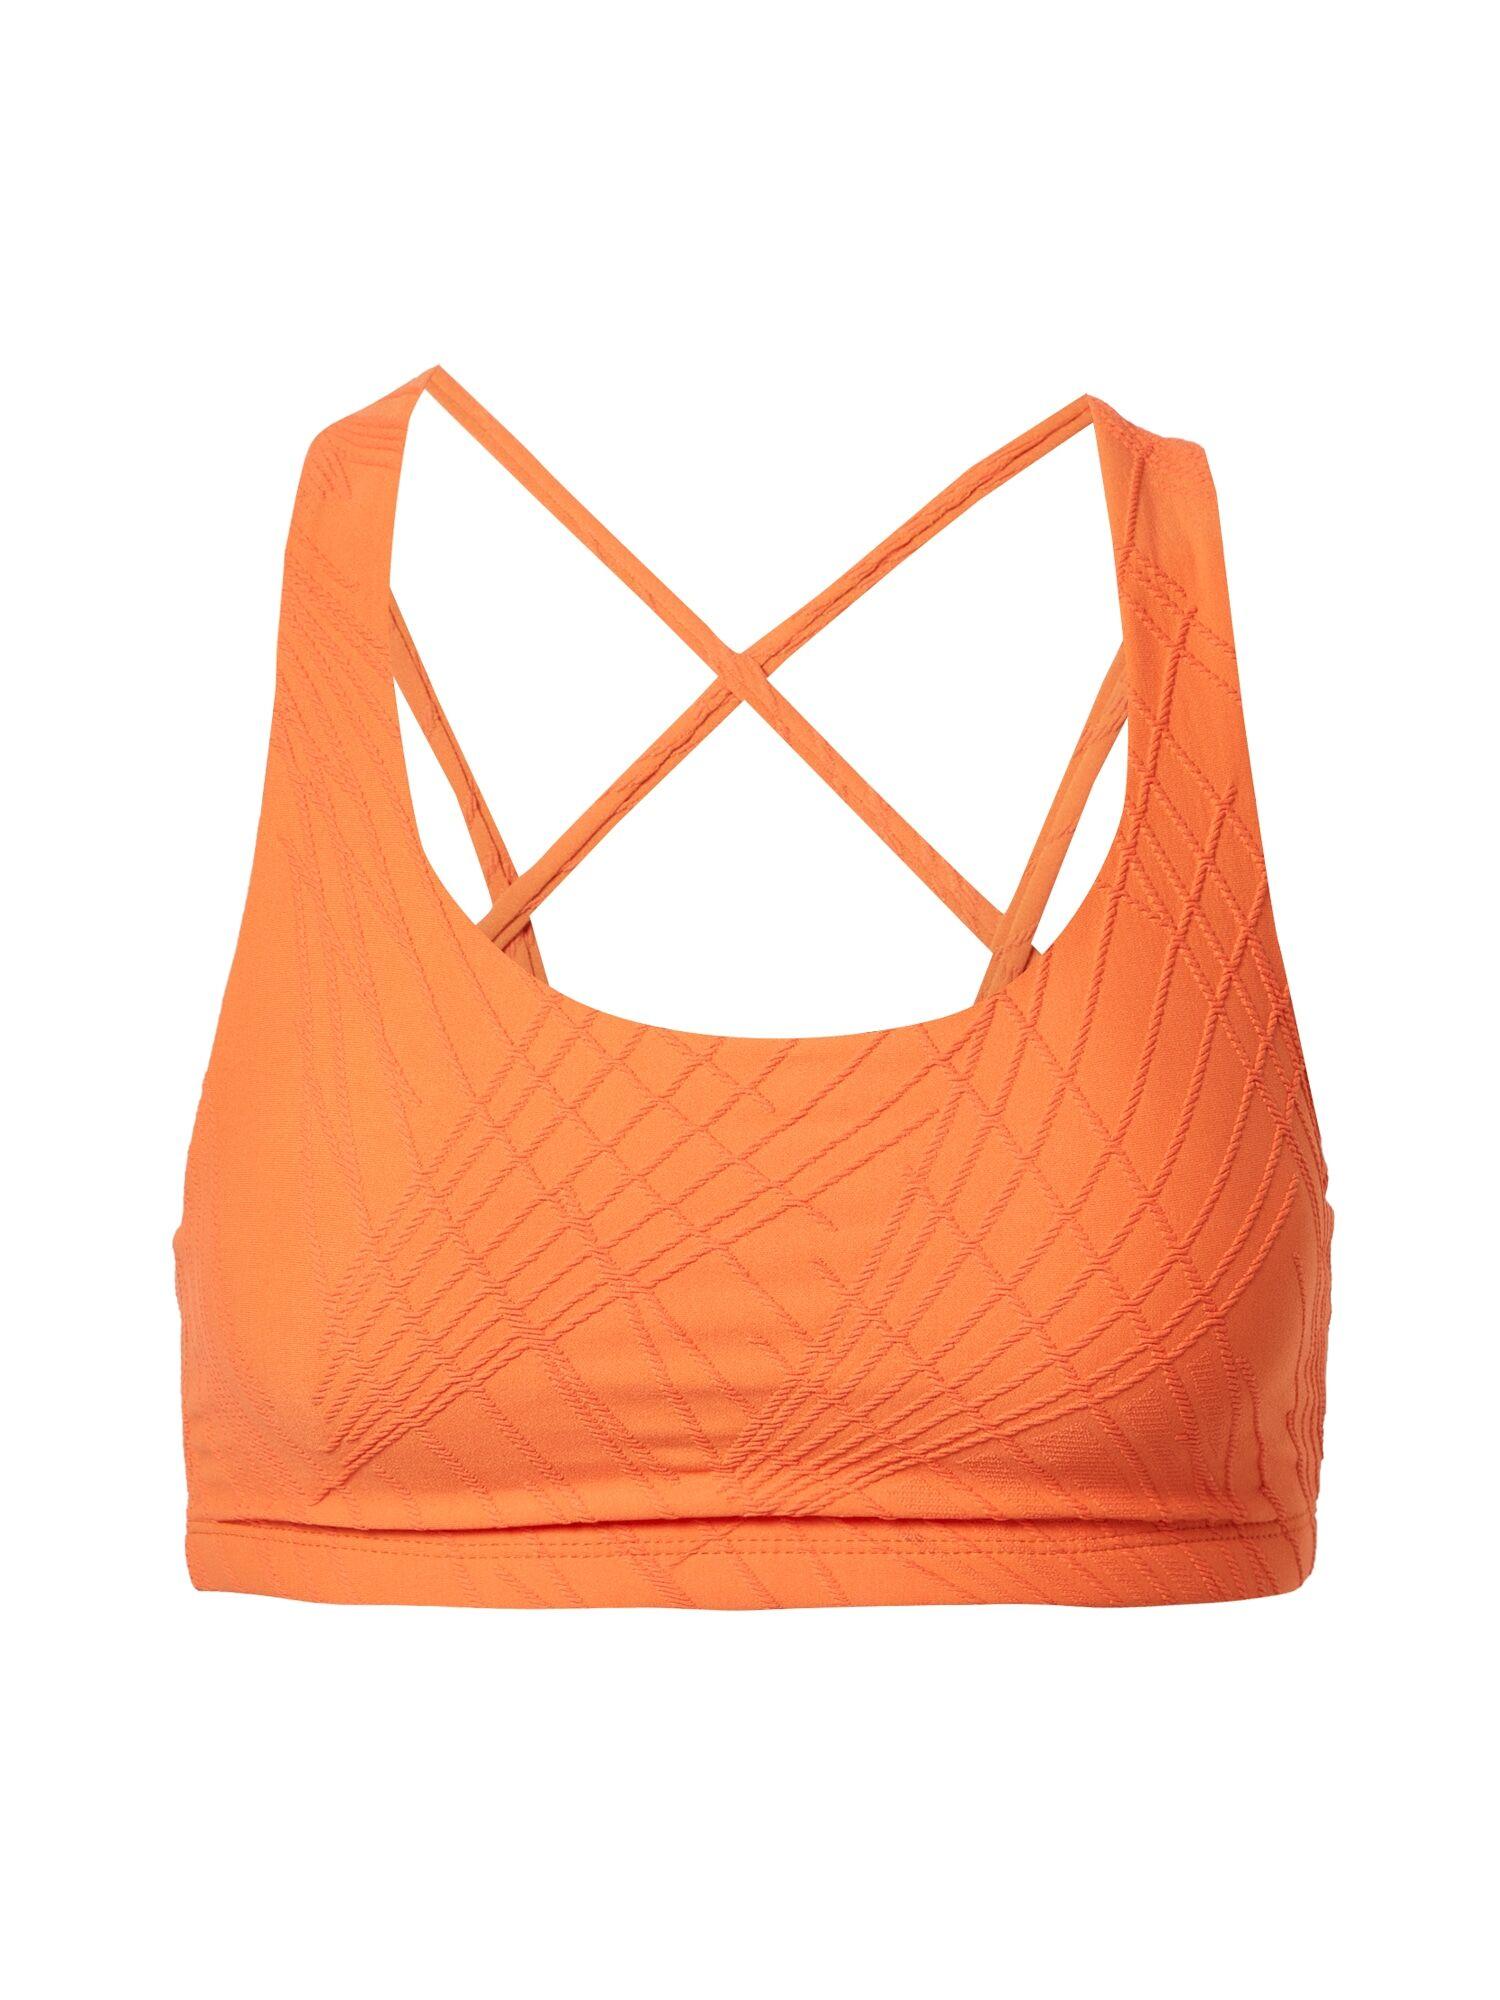 Onzie Soutien-gorge de sport 'Selenite Mudra'  - Orange - Taille: M-L - female